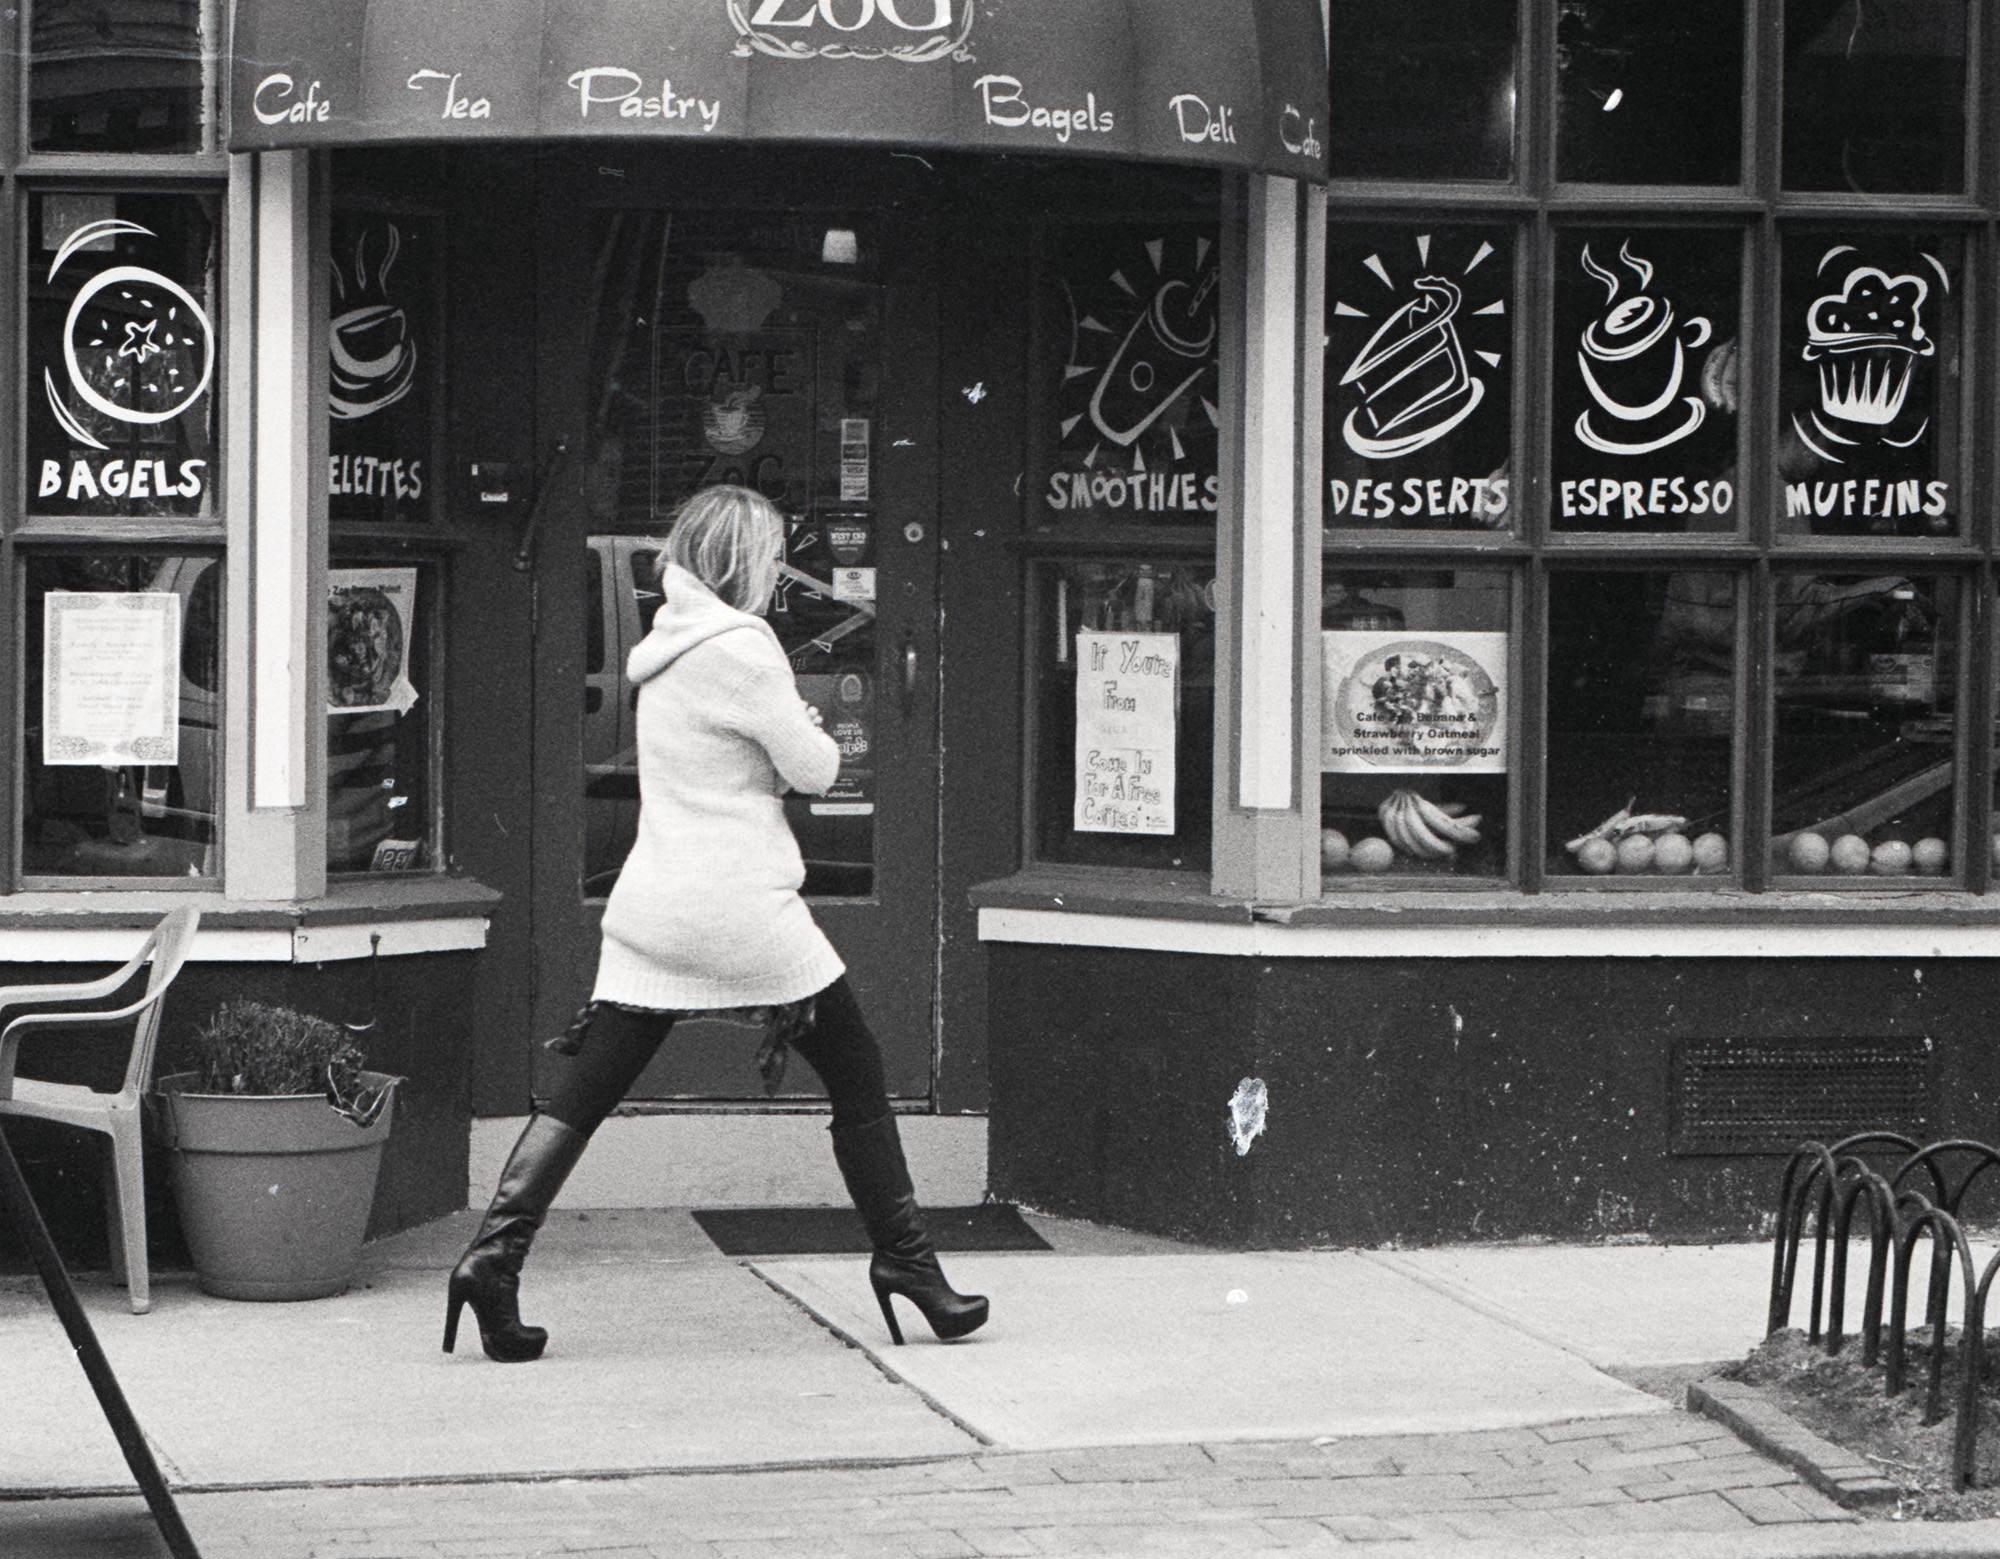 Louis_Sousa_film_photographer_03.jpg